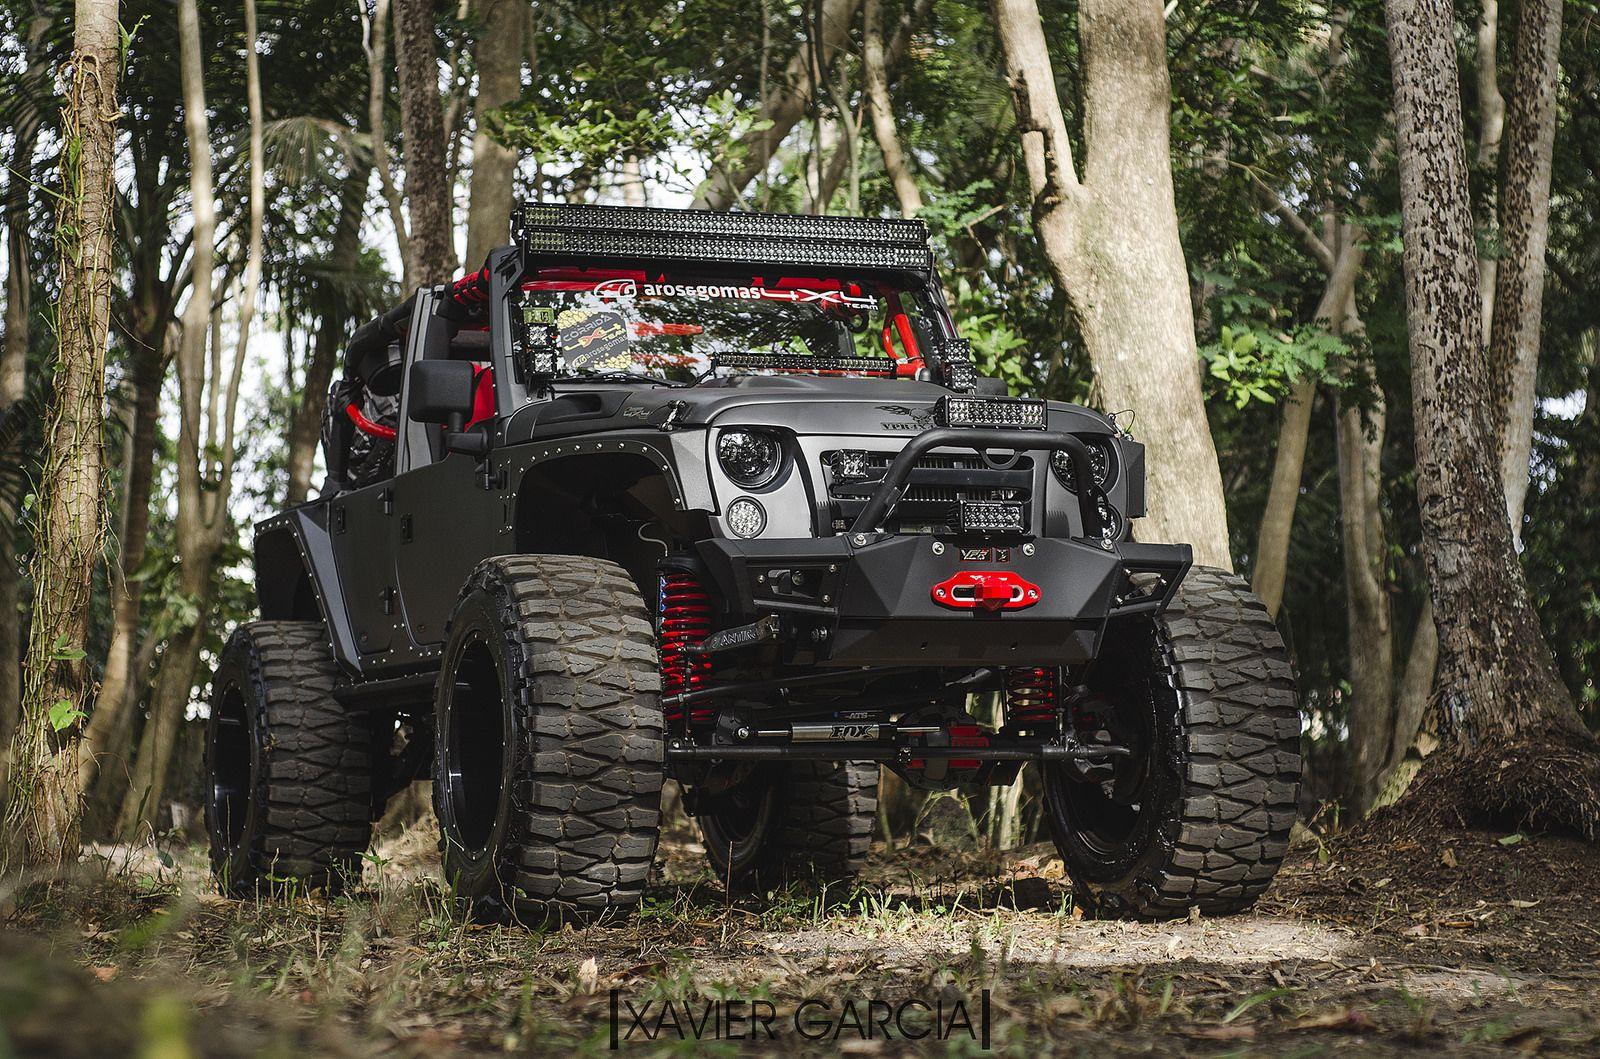 Aros Gomas Vpr Bumpers Jeep Wrangler 4x4 Trucks Road